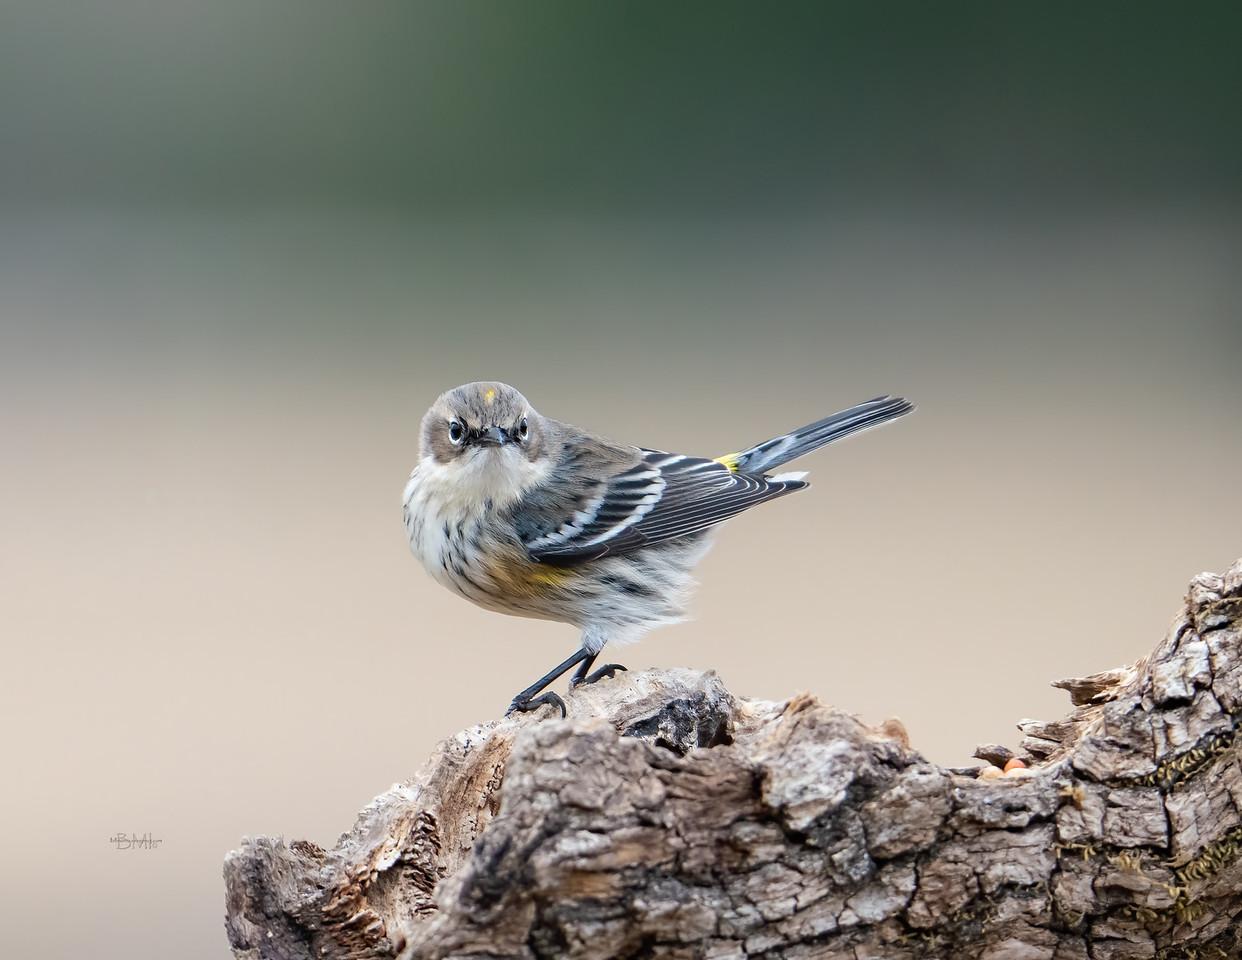 IMAGE: https://photos.smugmug.com/Beautyinthetreesandintheair/Birds/i-6xVN9pj/0/bc46b003/X2/Yellow-rumped%20warbler_9_12-30-2020-12-X2.jpg